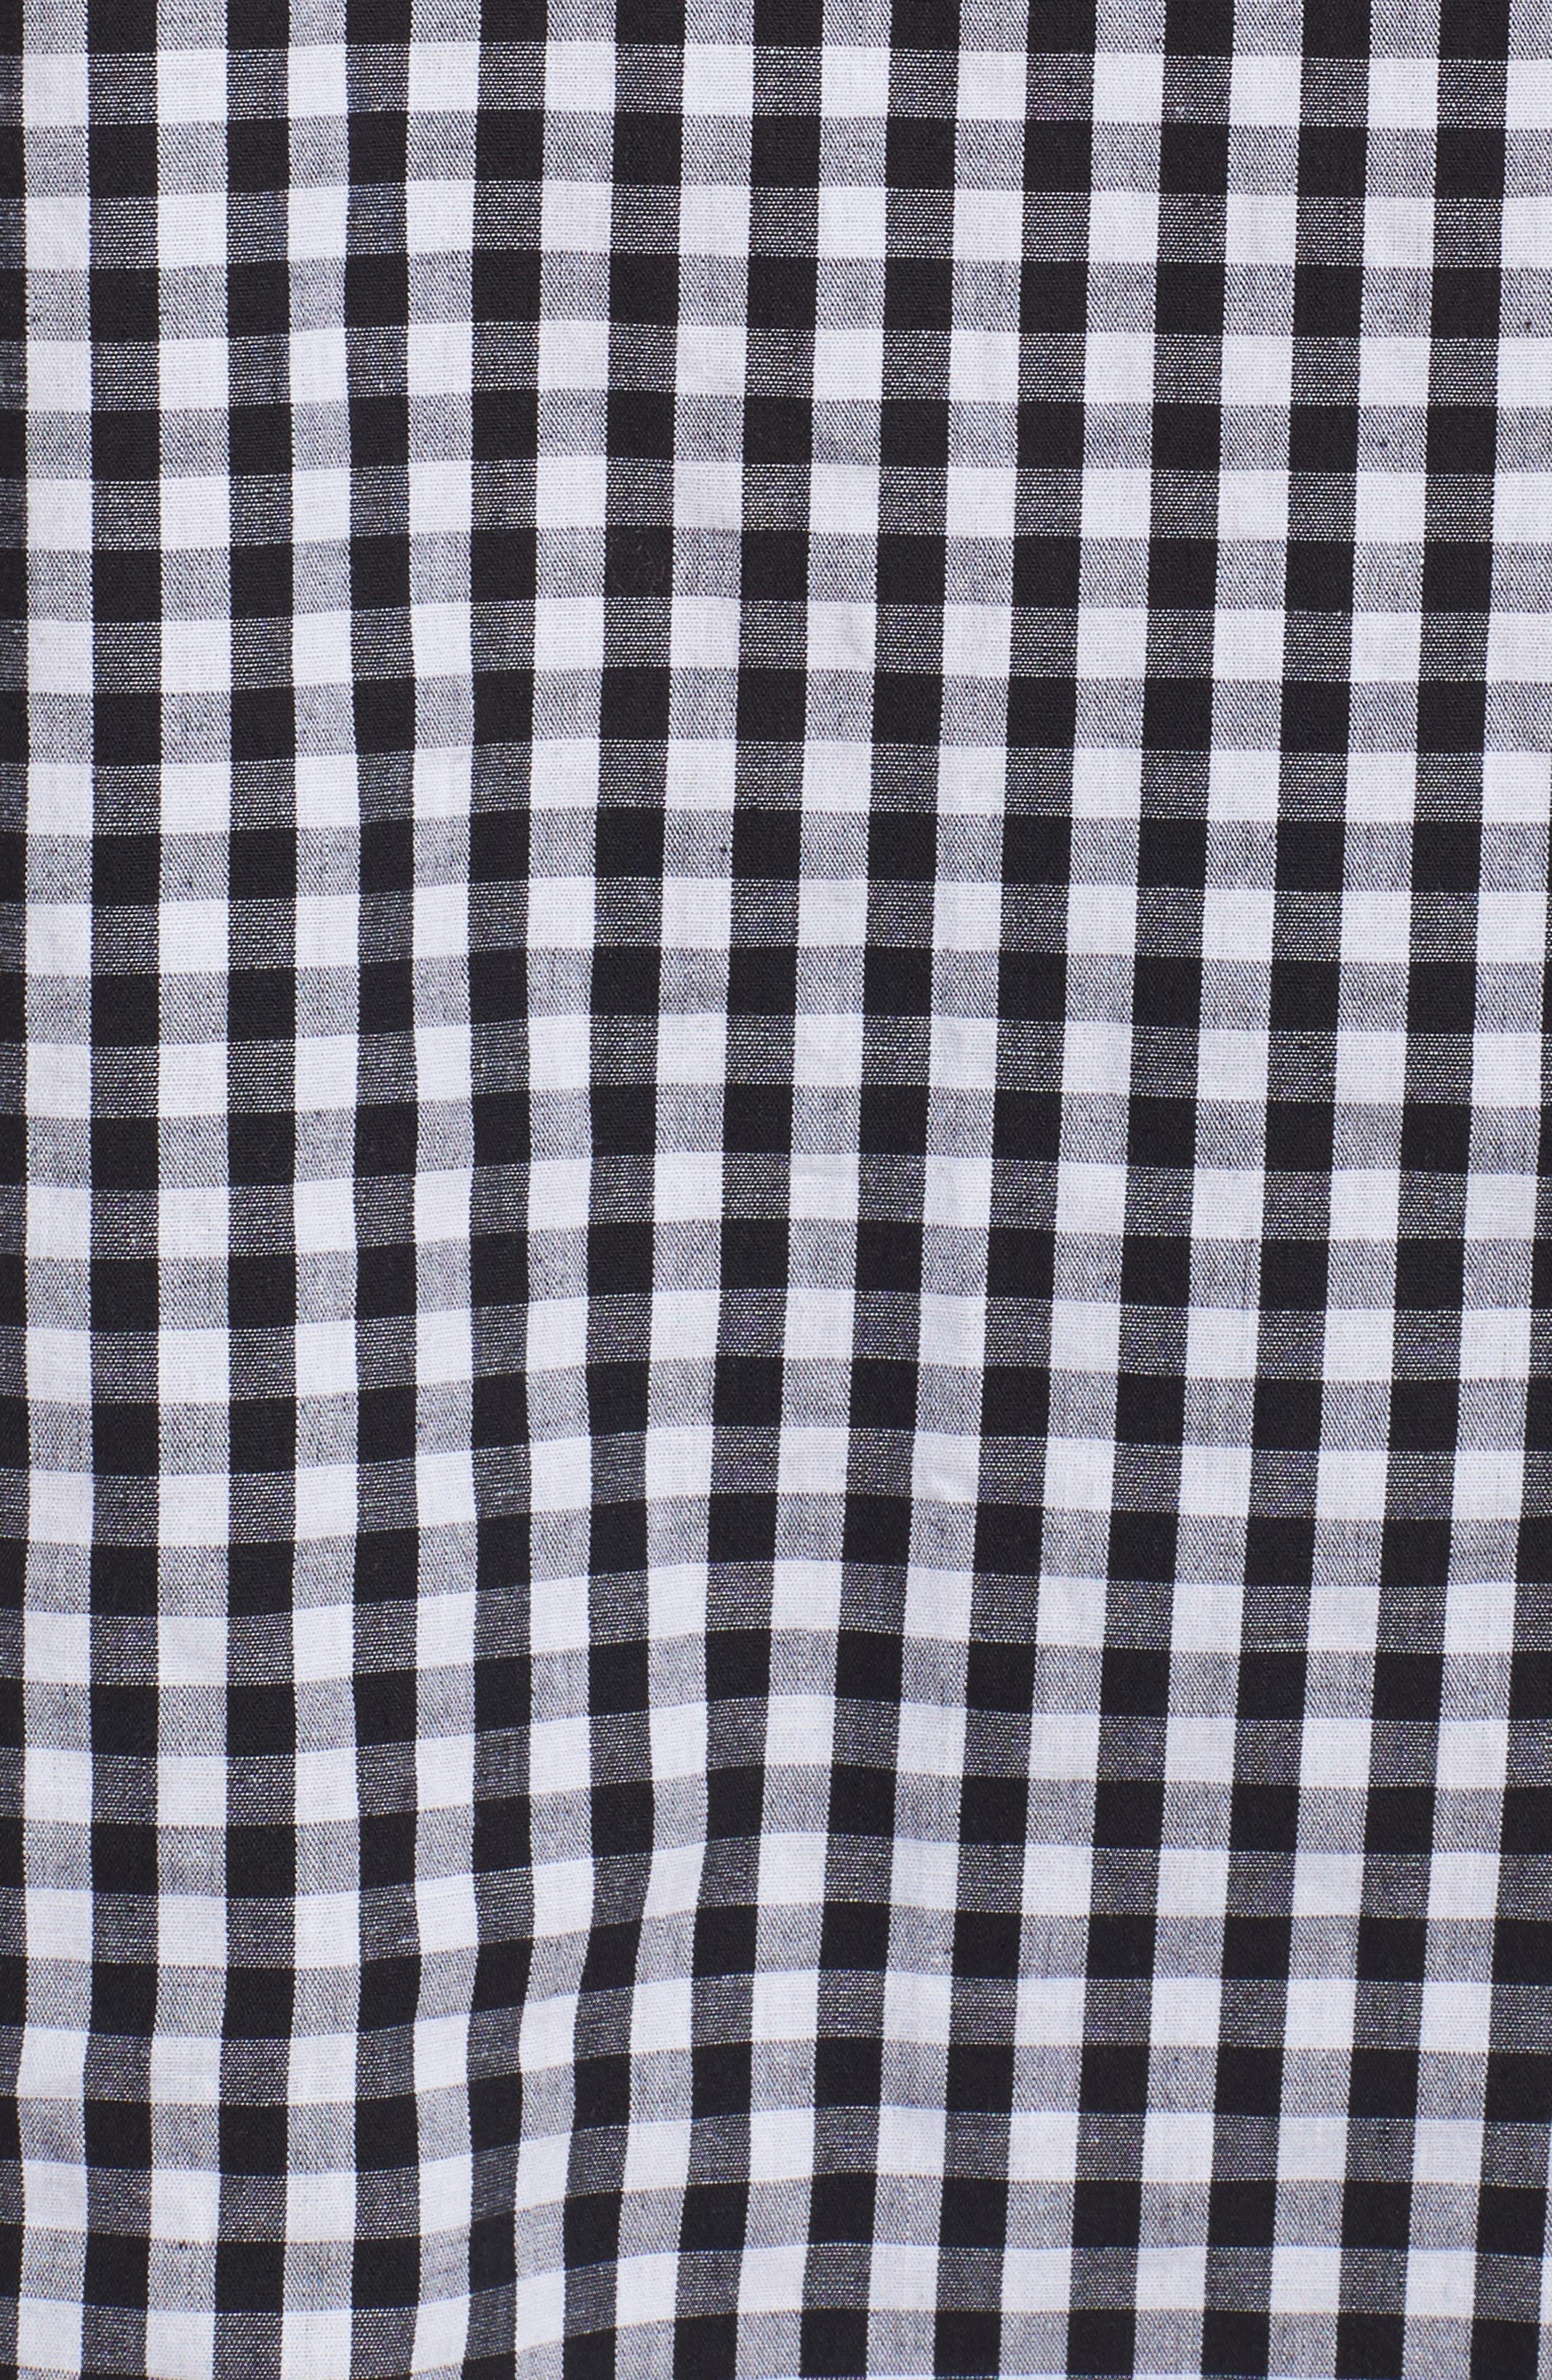 Bell Sleeve Off the Shoulder Shirt,                             Alternate thumbnail 6, color,                             Black / White